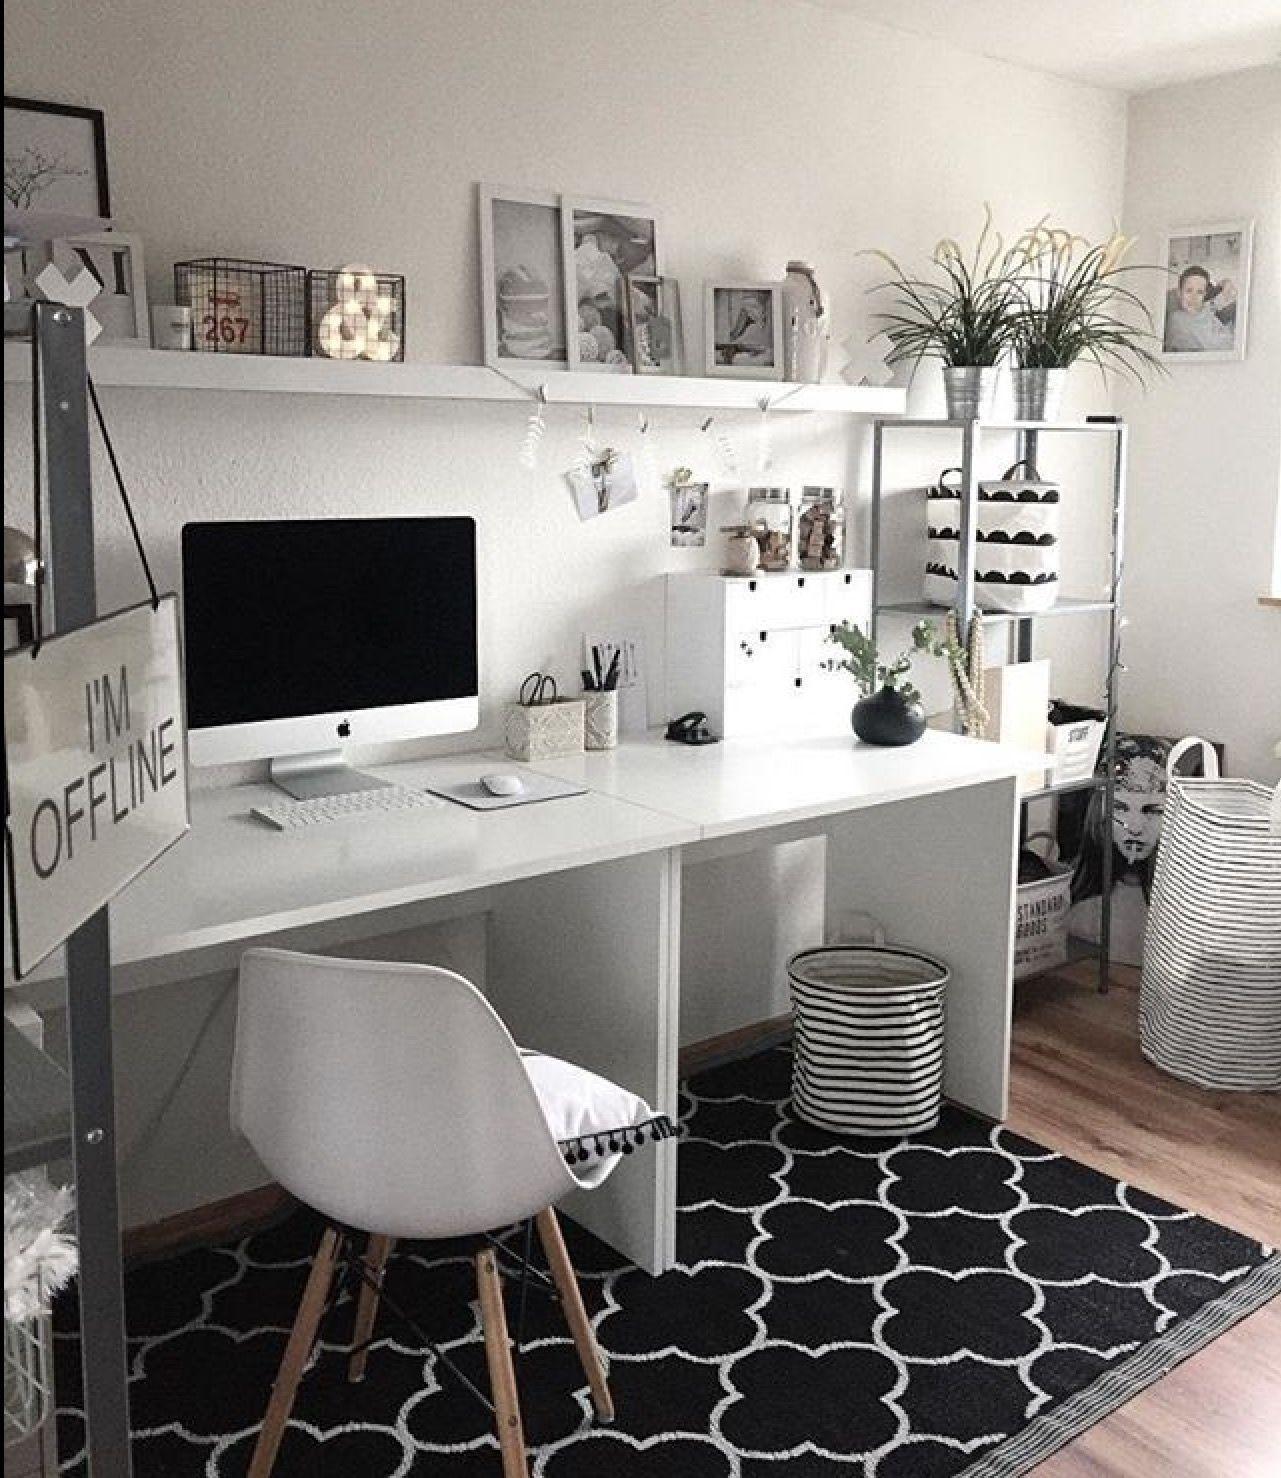 #bedroomdecor #bedroomideas #Desk #homedecor #work office decor Birthday#bedroomdécor #bedroomideas #birthday #decor #desk #homedecor #office #work